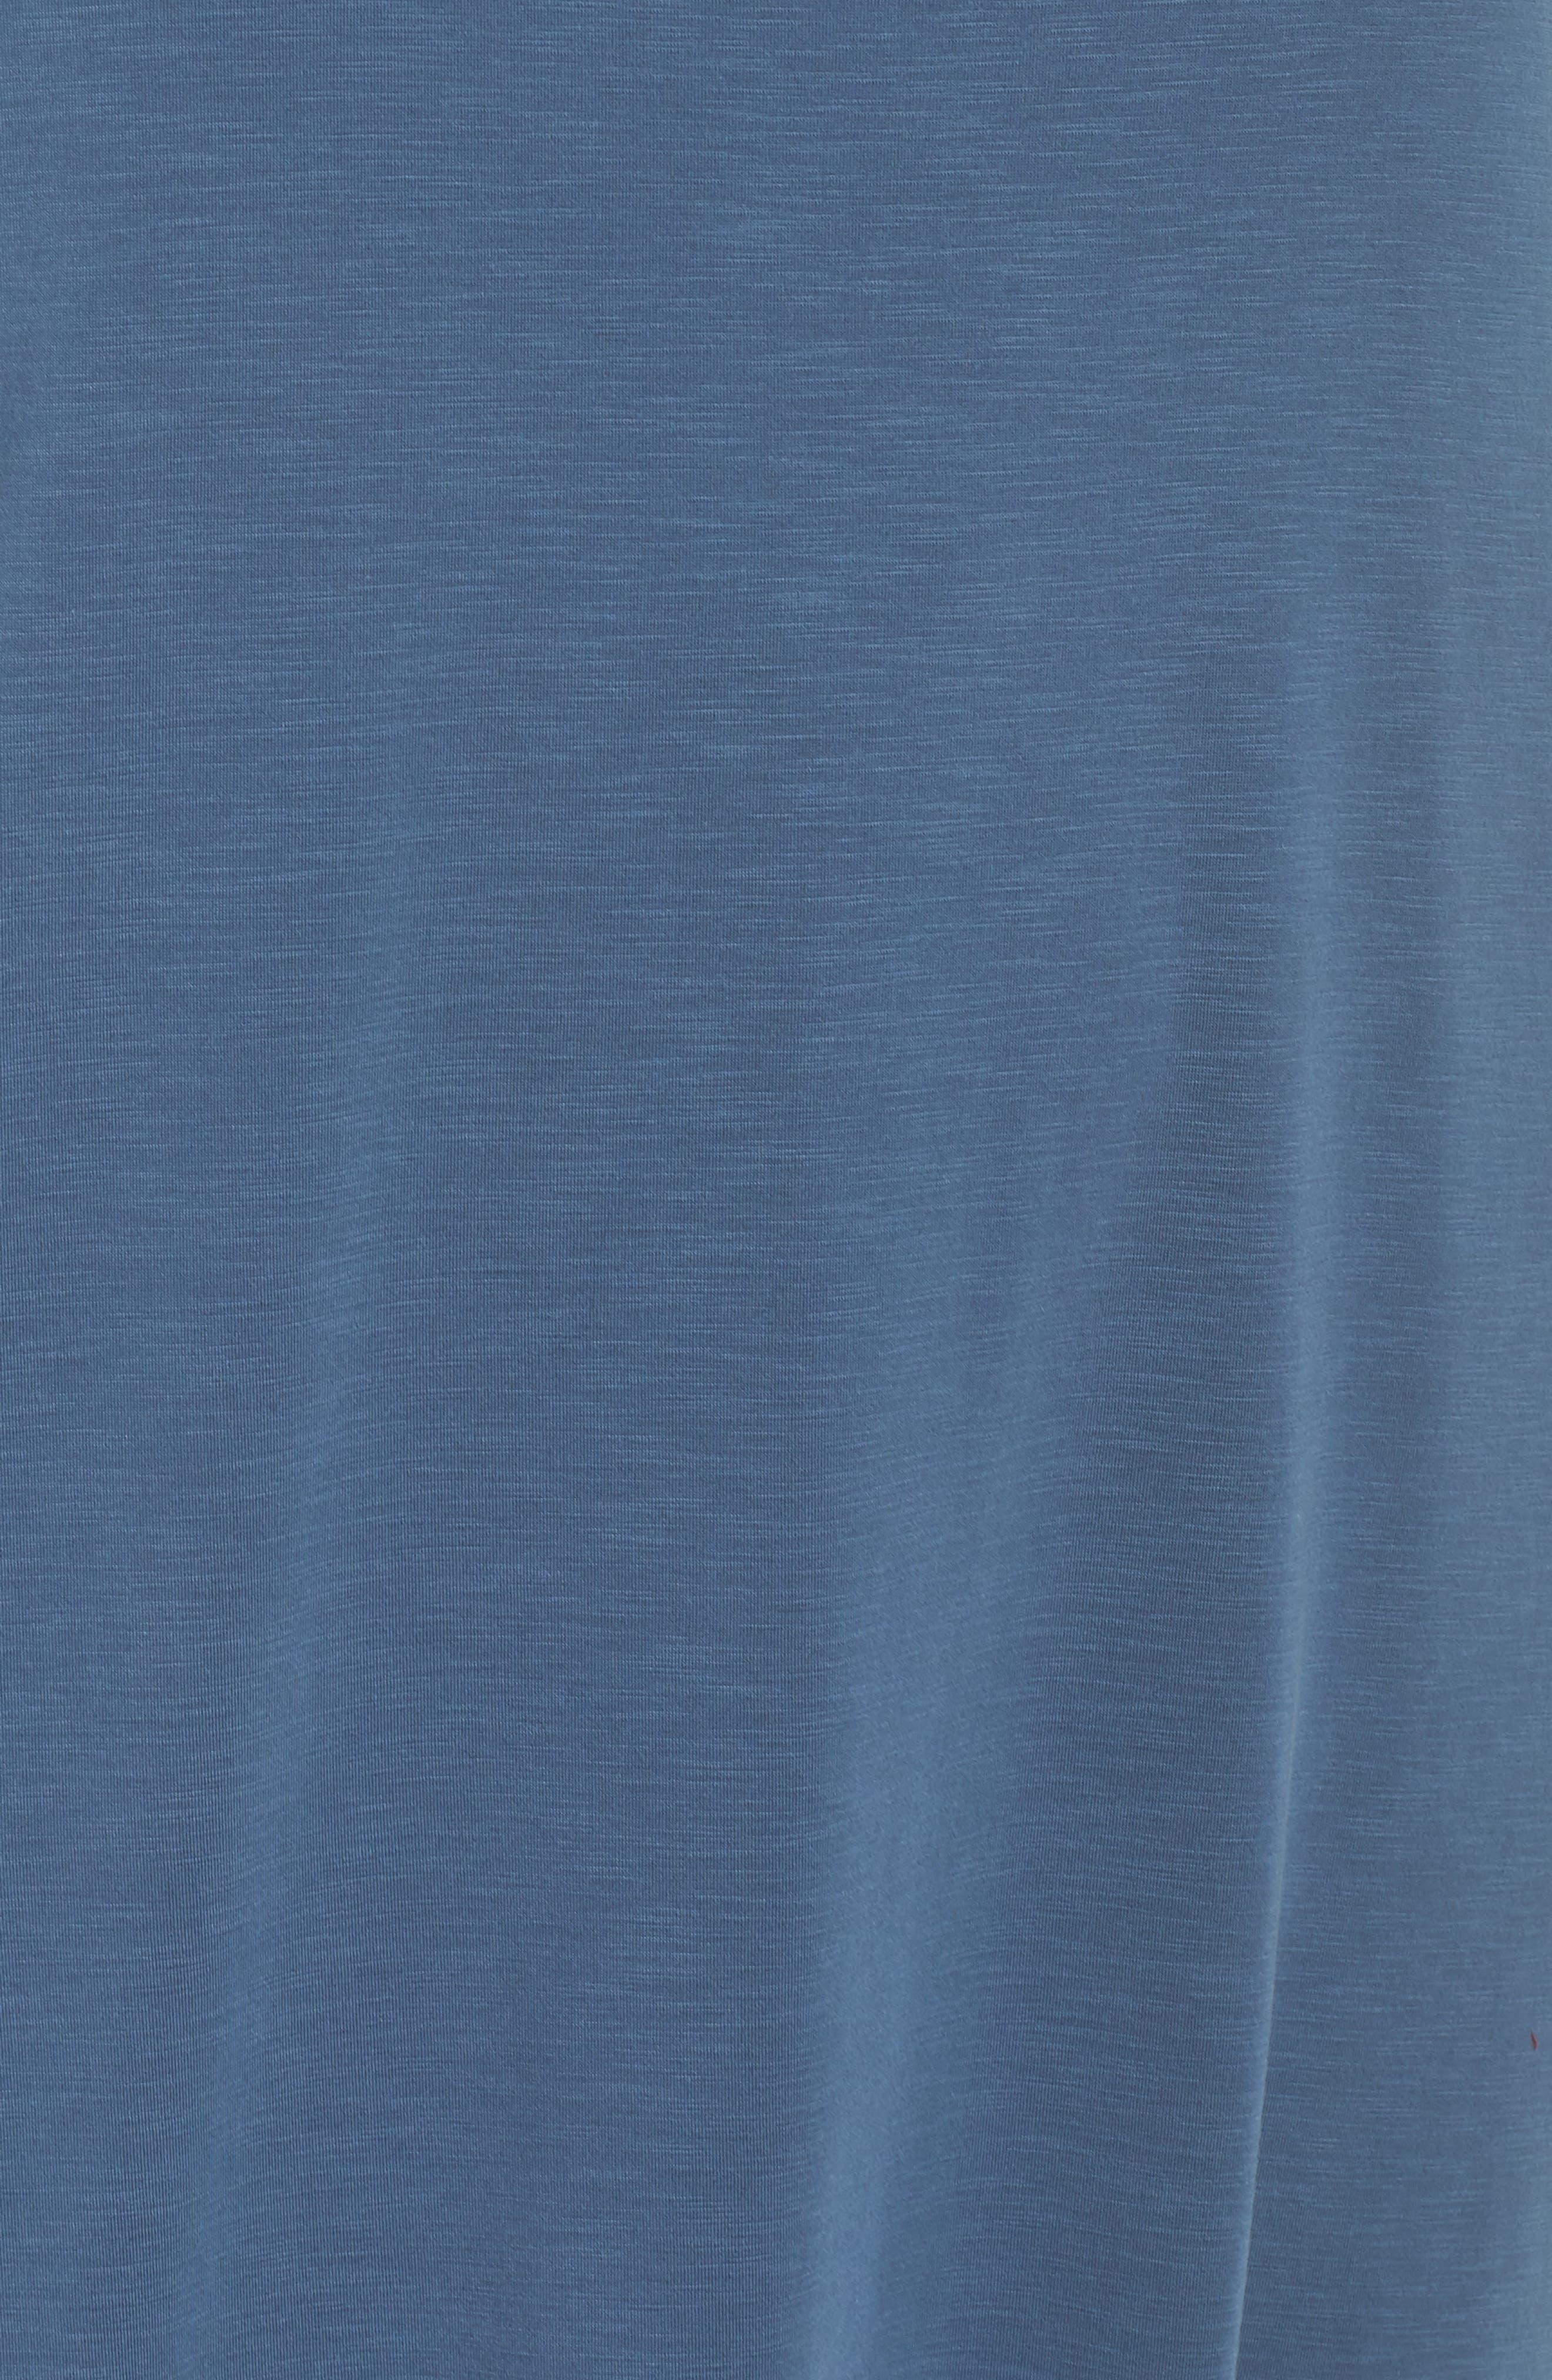 Boardwalk Jersey High/Low Dress,                             Alternate thumbnail 6, color,                             Washed Rich Indigo